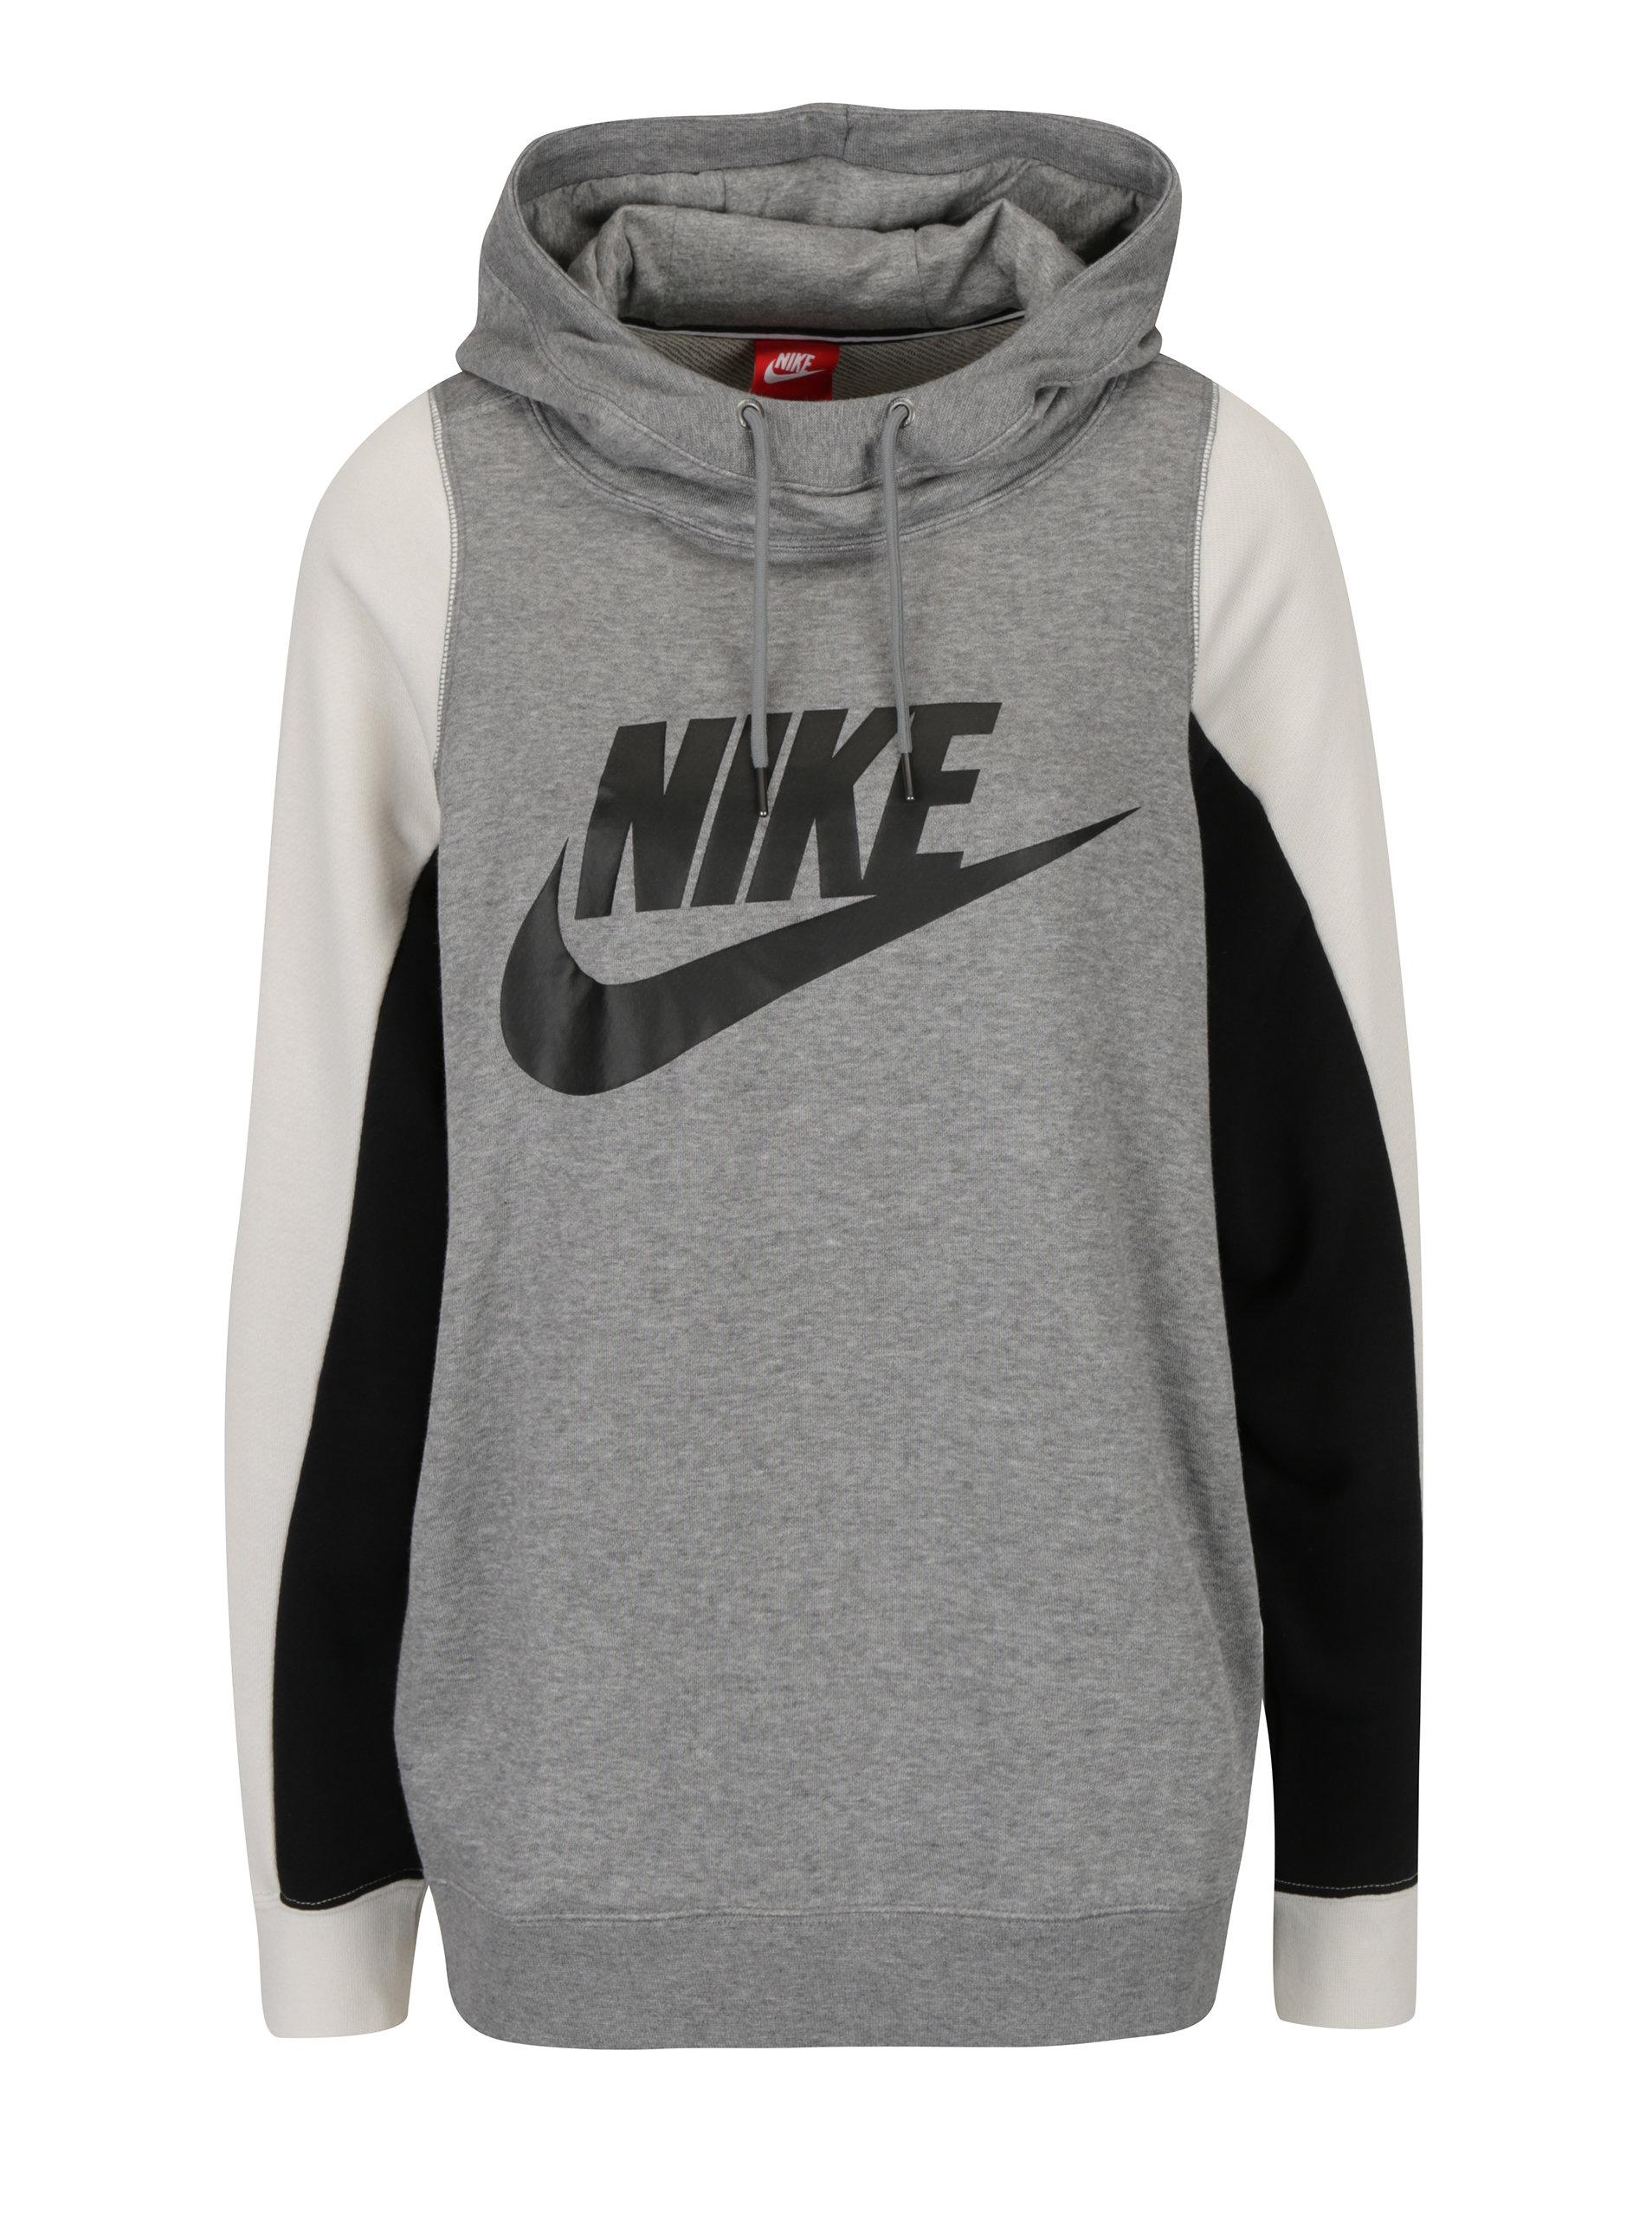 Sivá melírovaná dámska mikina s potlačou a kapucňou Nike ... 9d29cdd78b